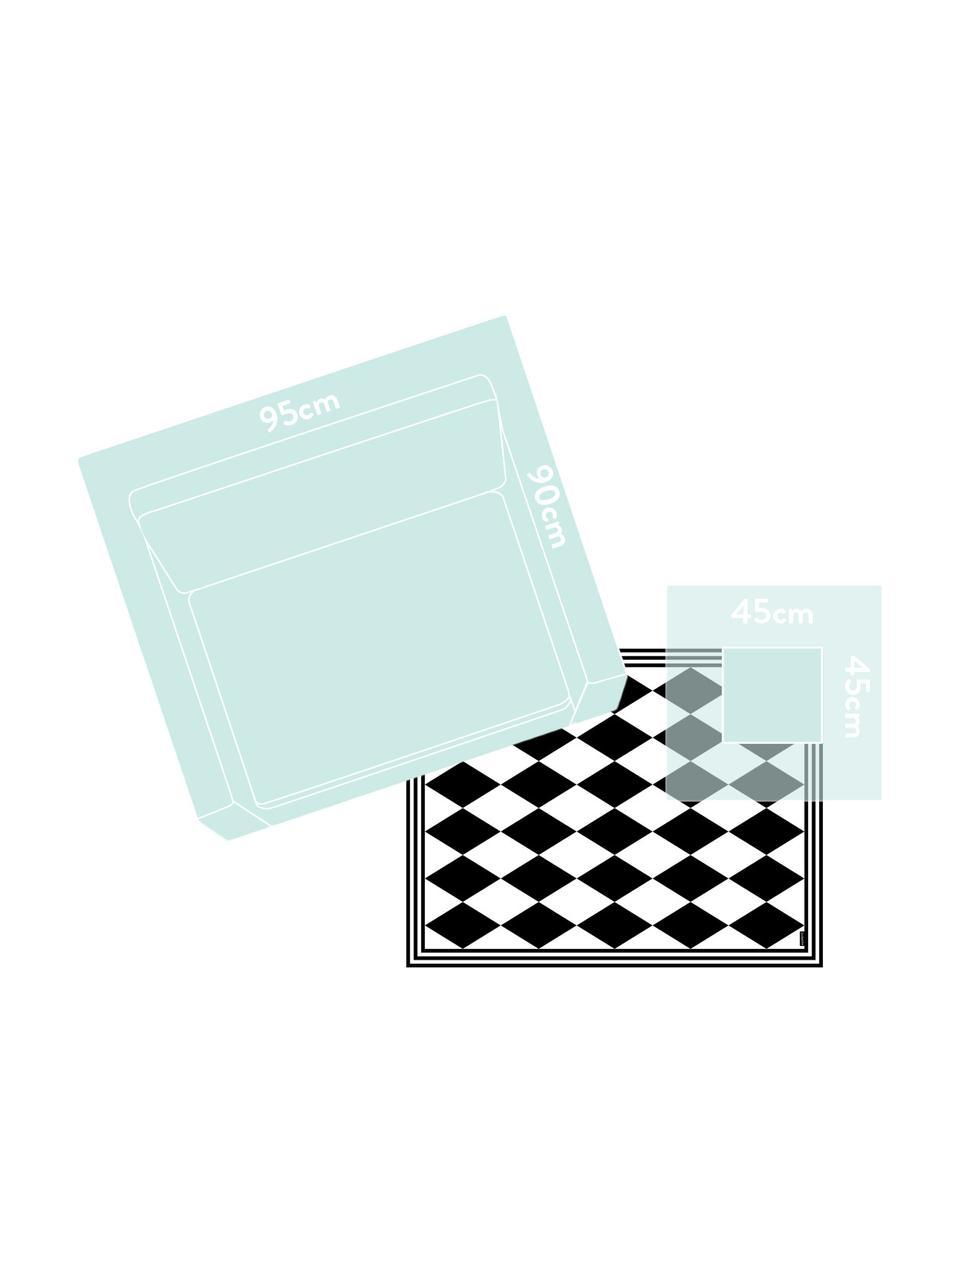 Vinyl-Bodenmatte Bobby II, Vinyl, recycelbar, Schwarz, Weiß, 65 x 85 cm